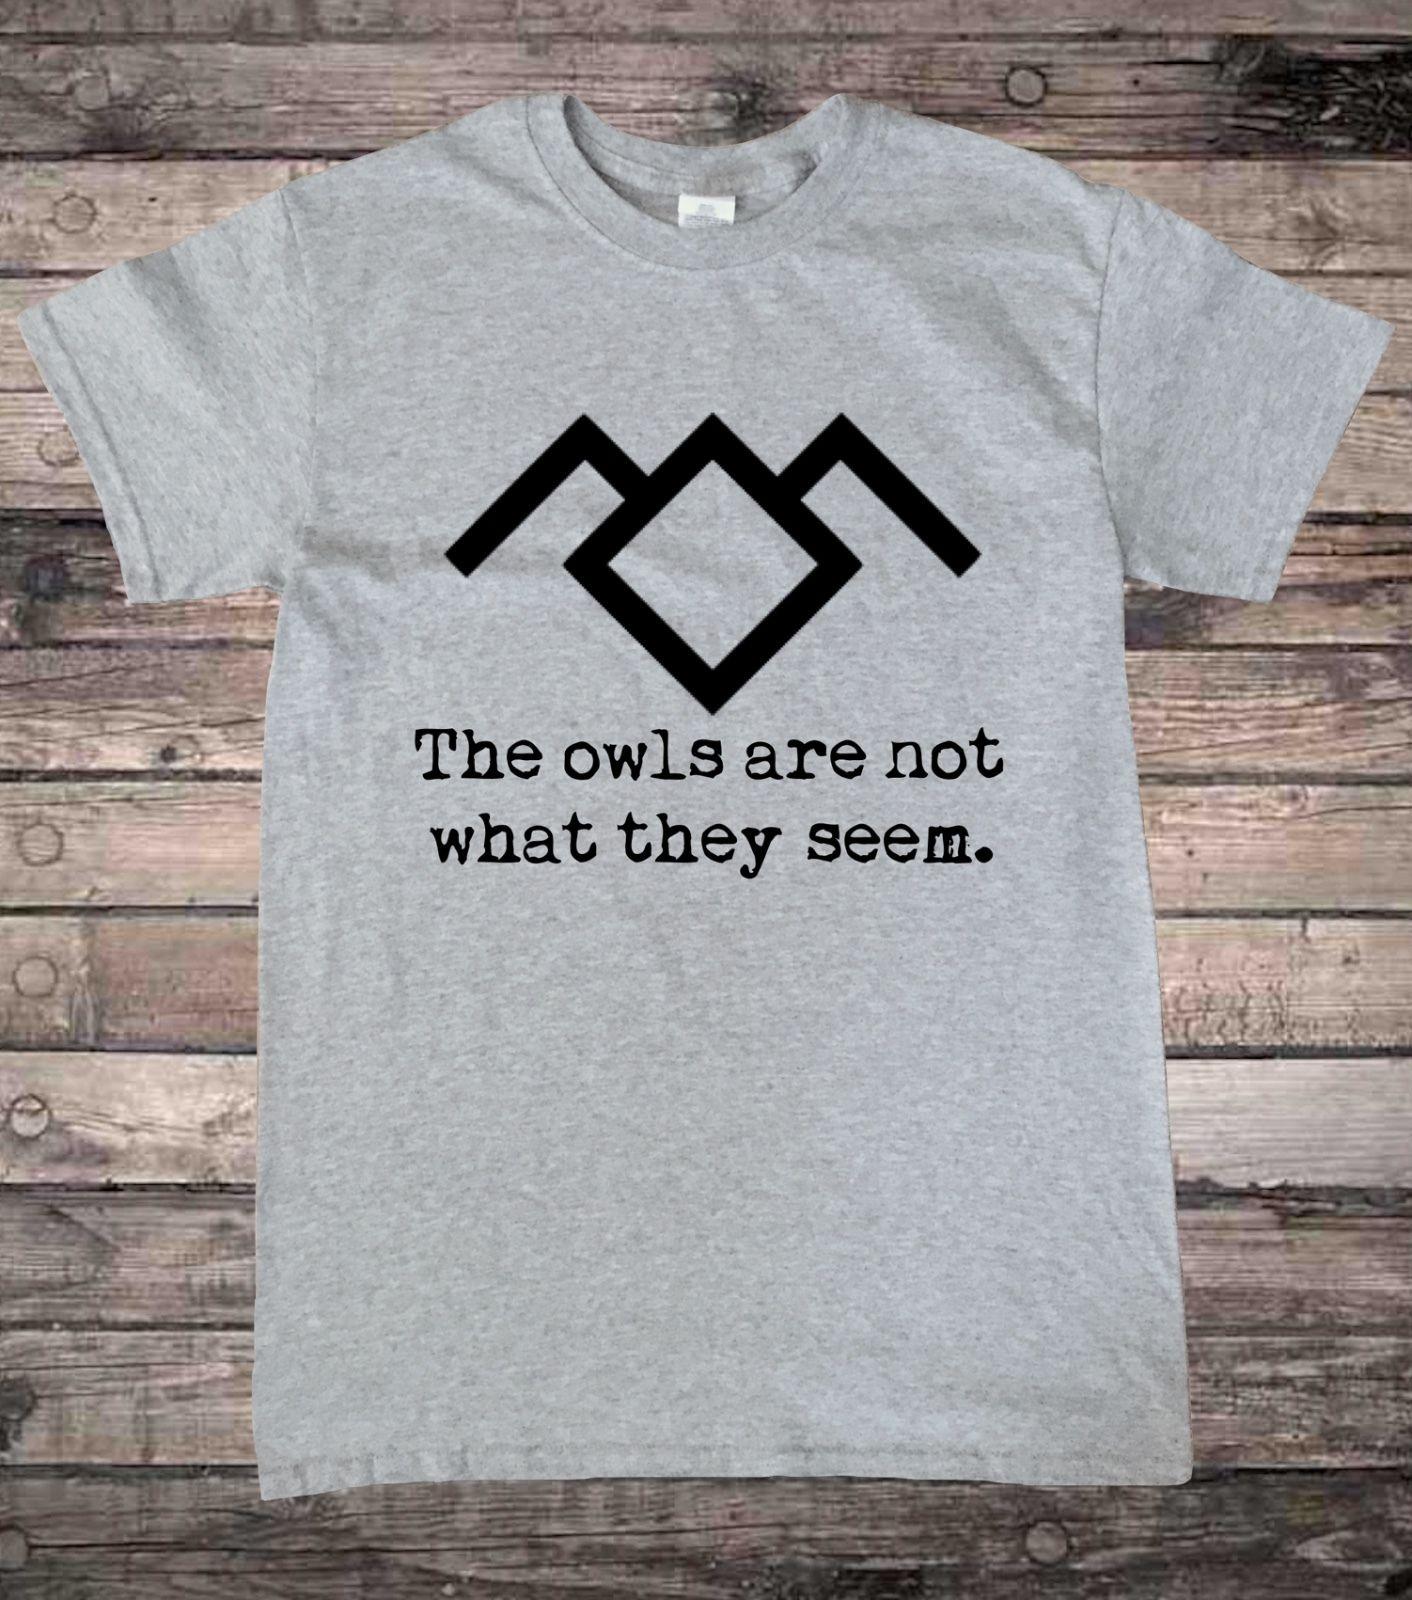 Twin Peaks Black Lodge Owl Quote T-Shirt Short Sleeve T Shirt Men T-Shirt Male Hipster Tops Sleeves Boy Cotton Men T-Shirt